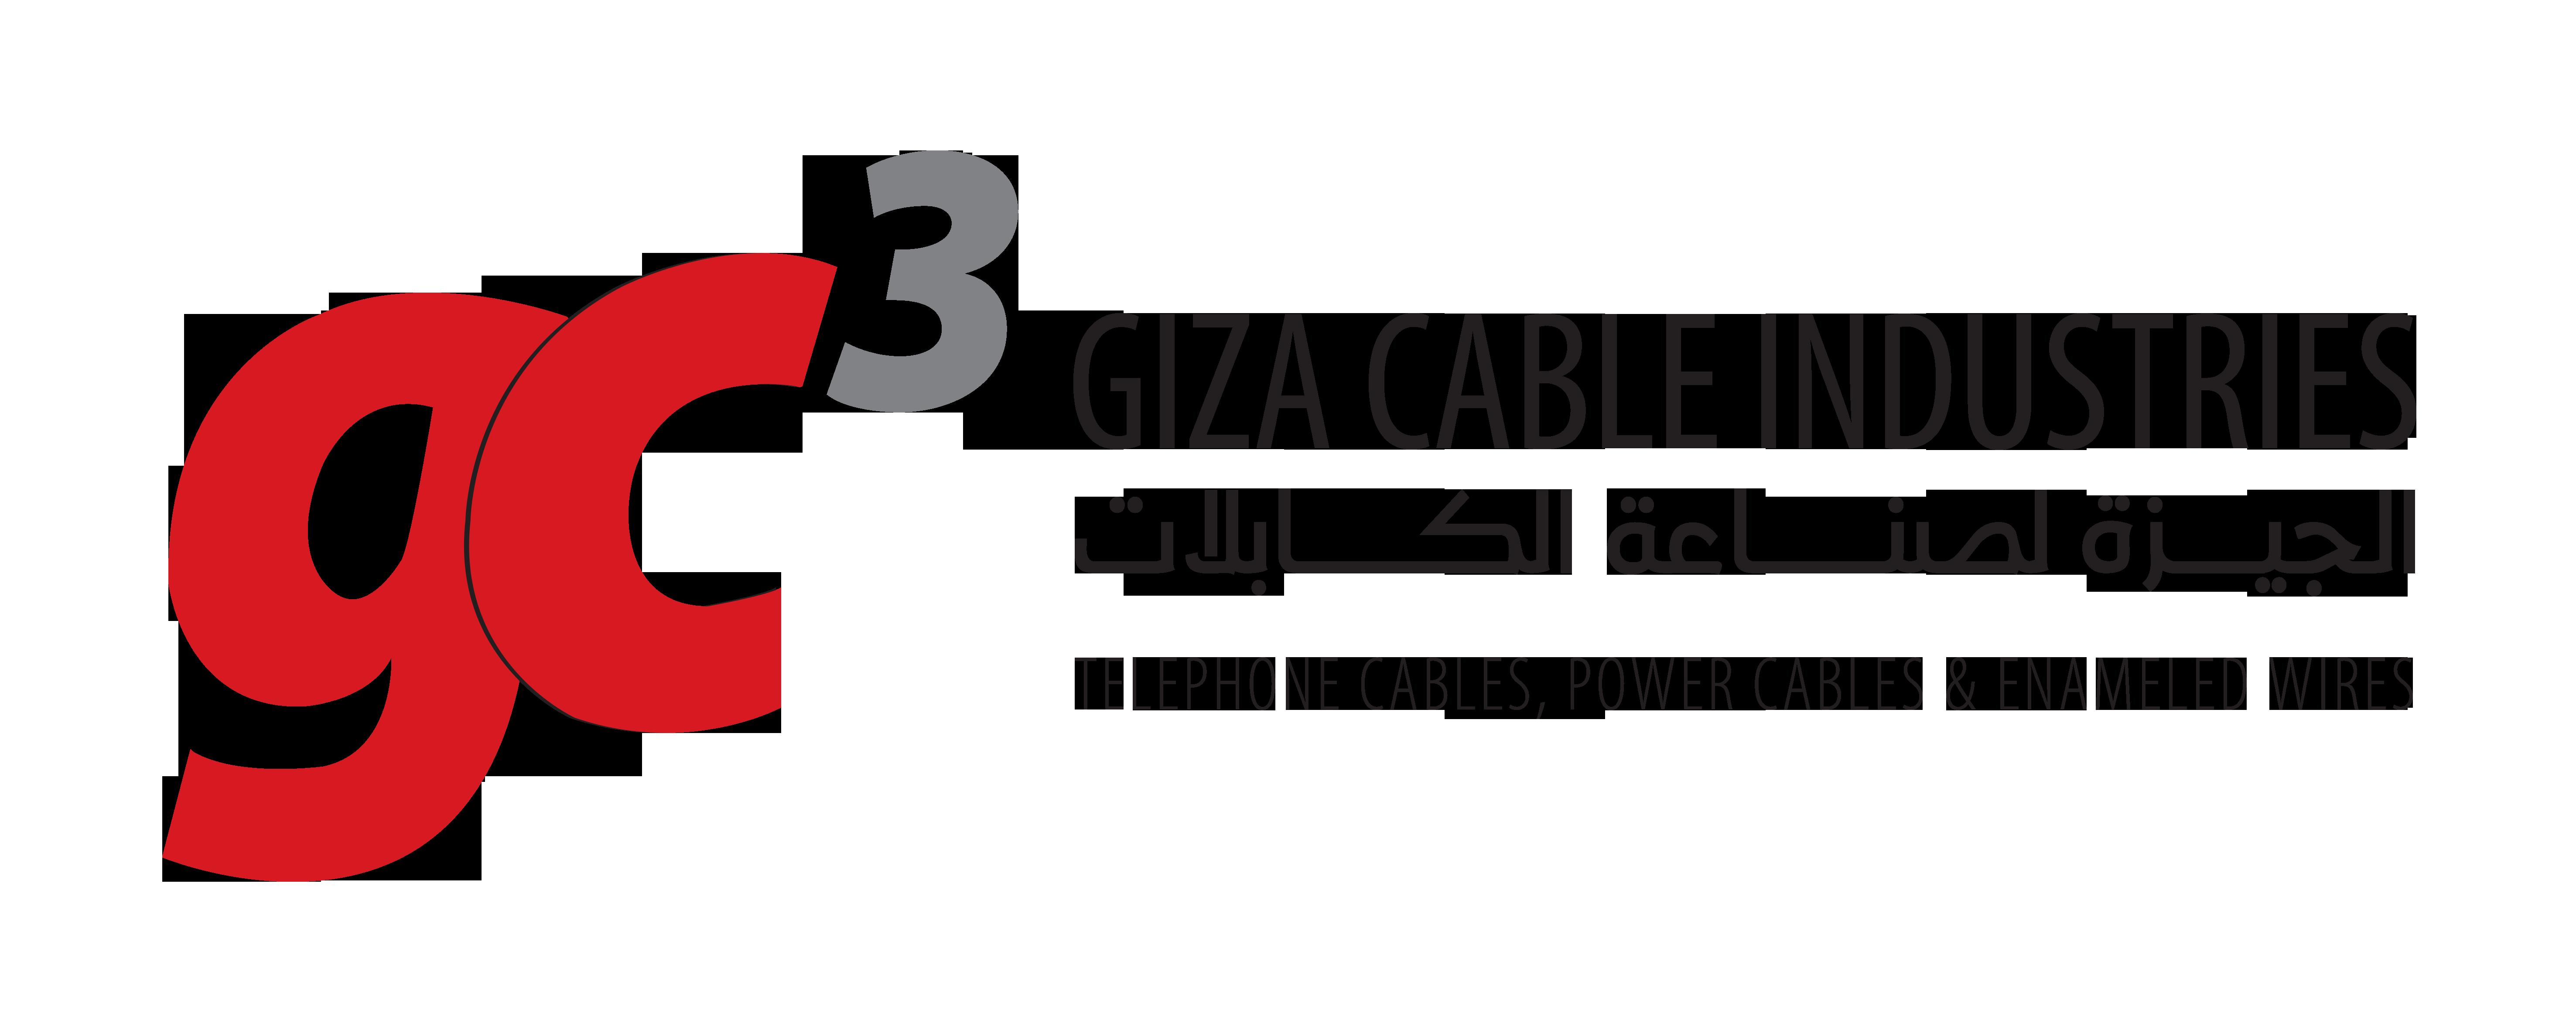 GIZA CABLE INDUSTRIES | الجيزة لصناعة الكابلات